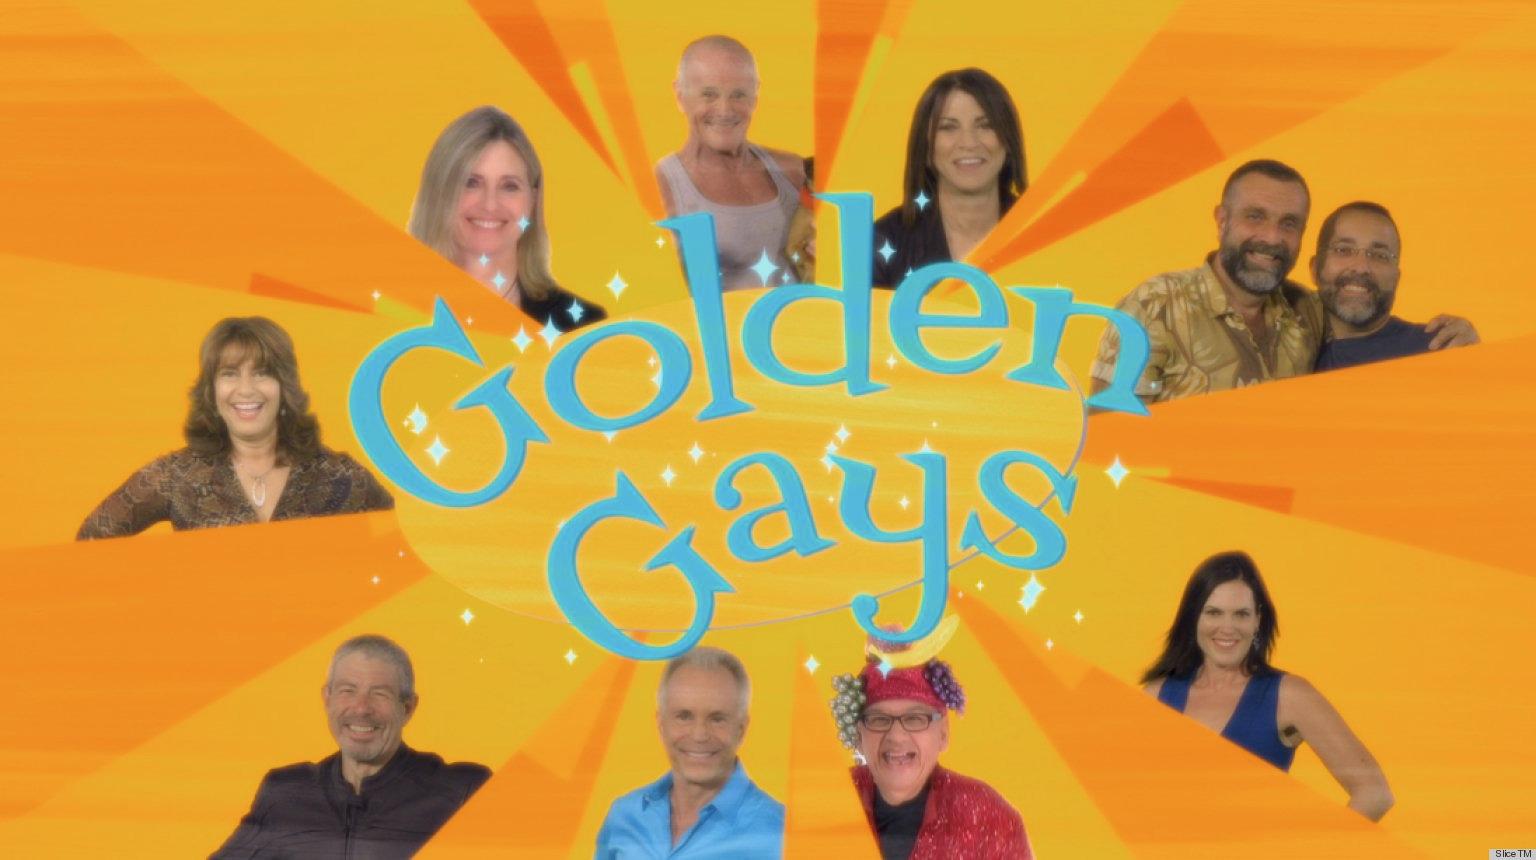 Show Golden Gays